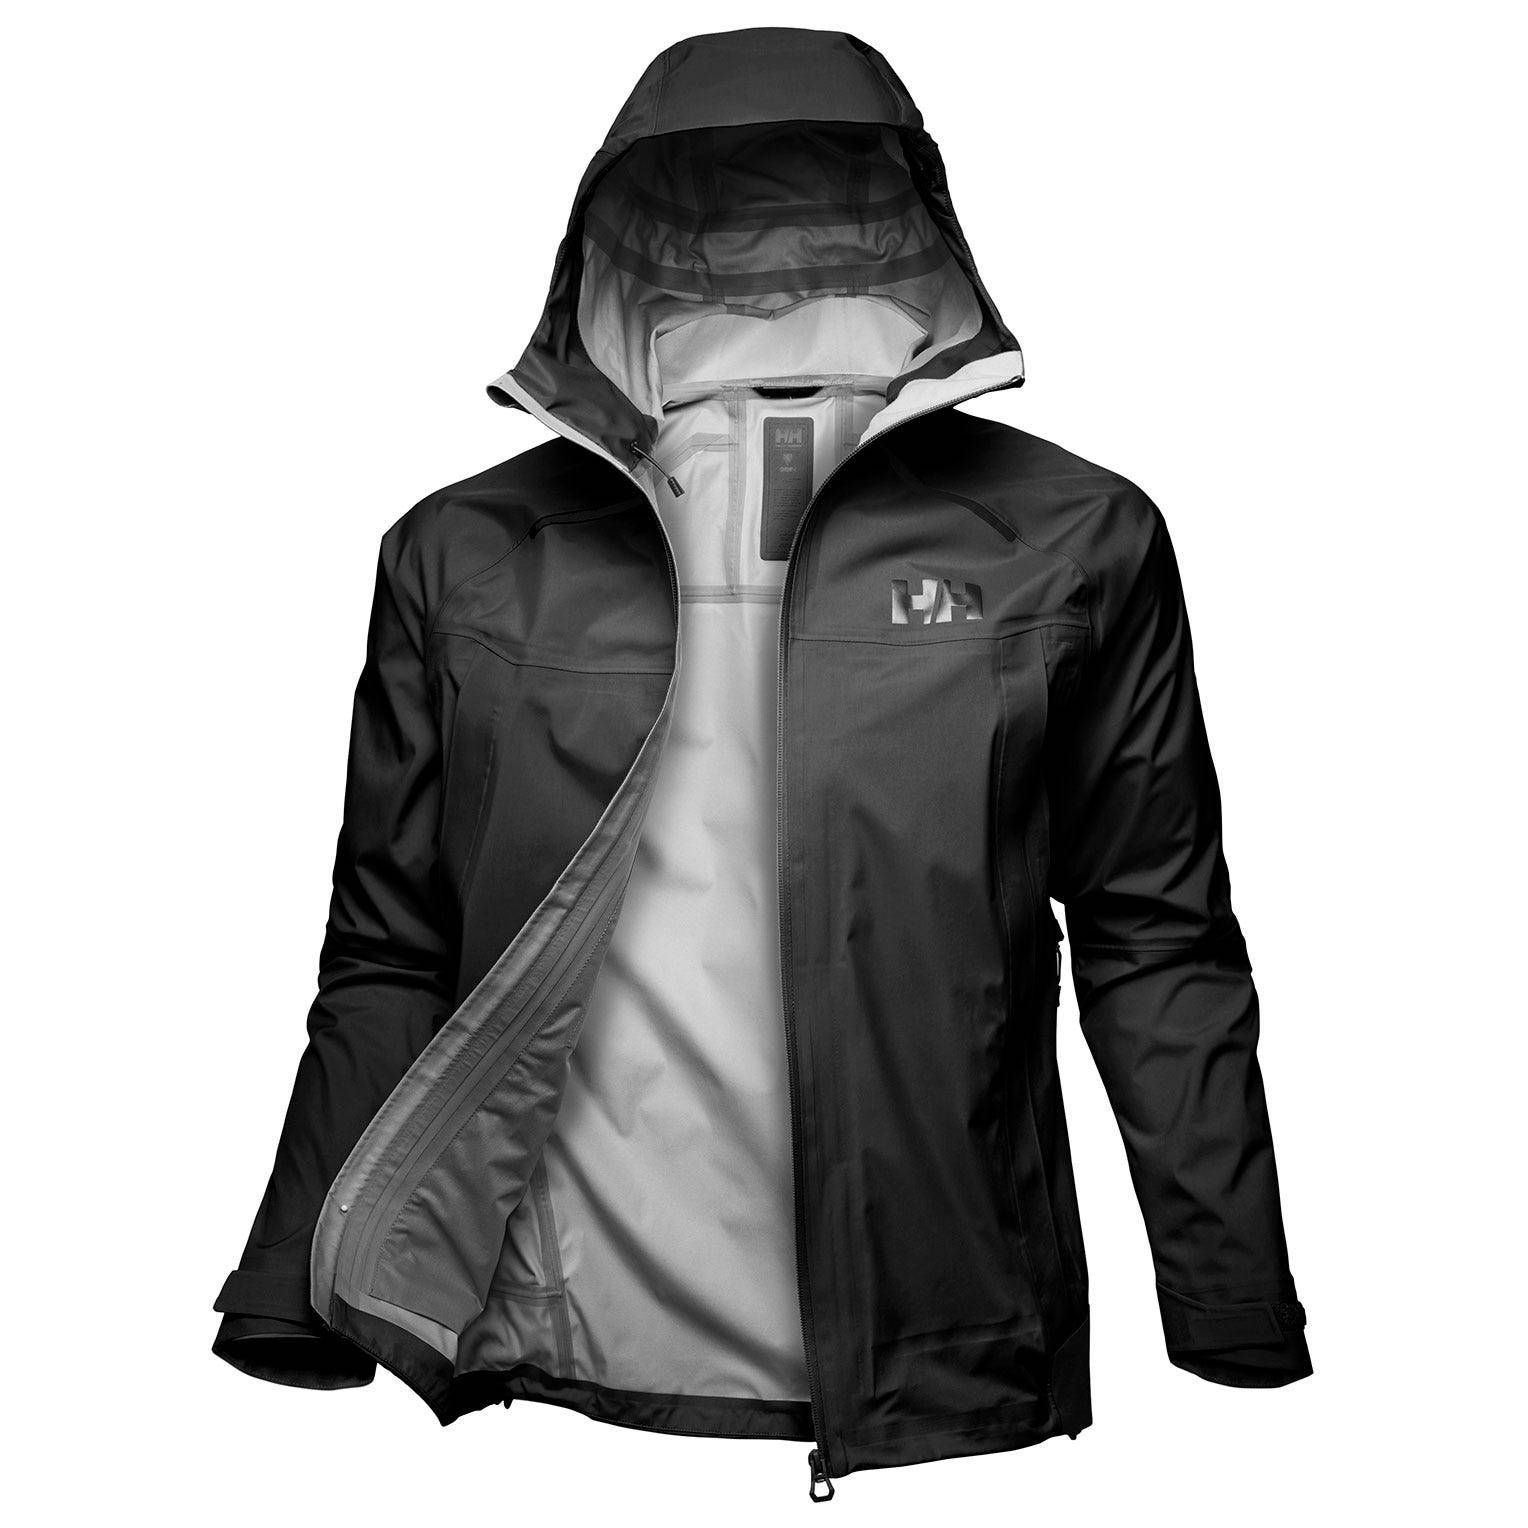 Helly Hansen Odin 9 Worlds Jacket Mens Hiking Black S